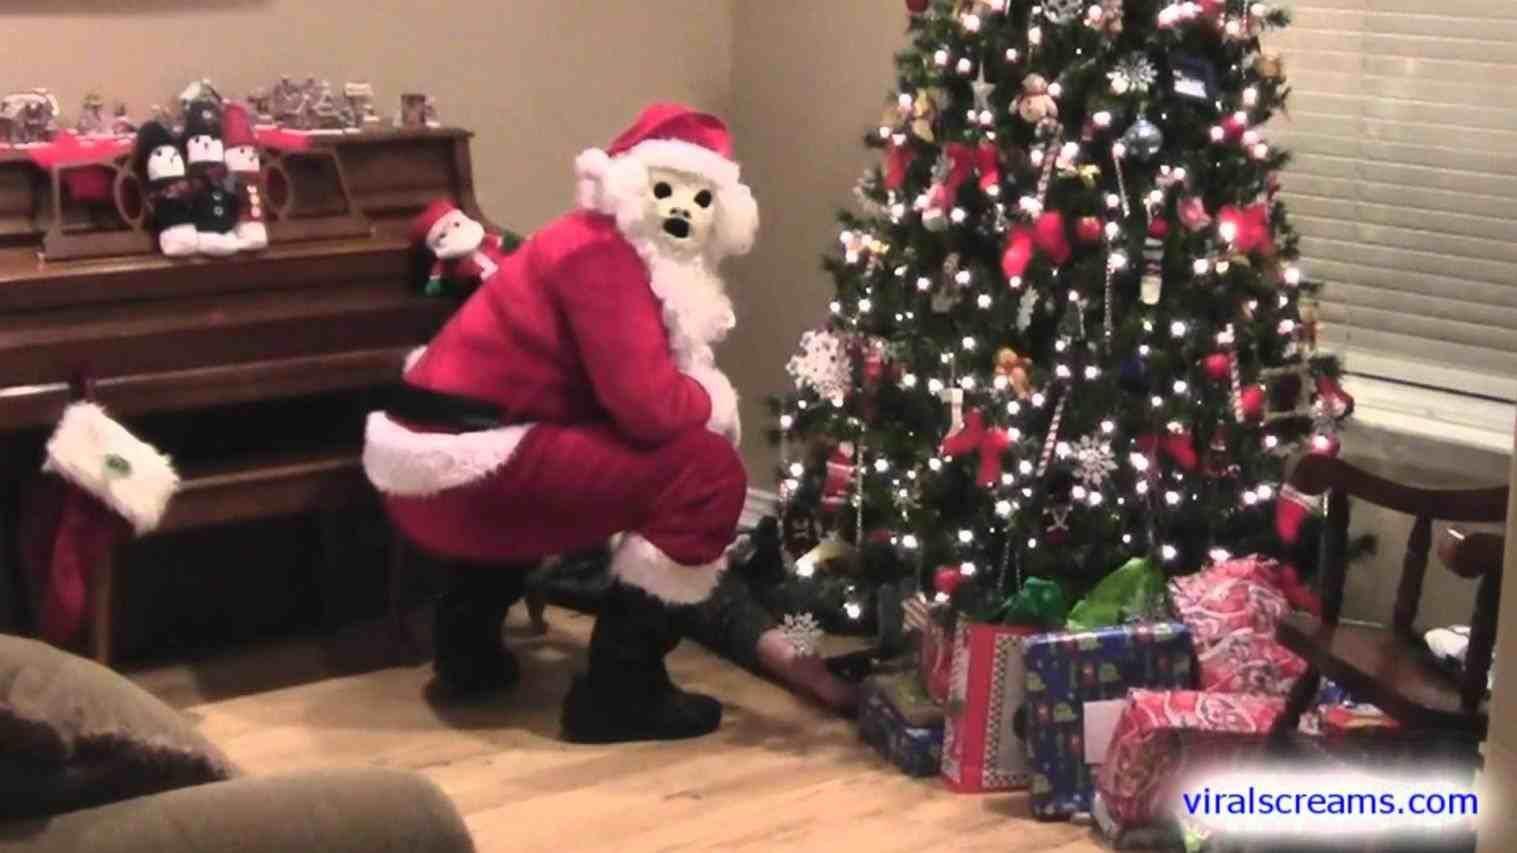 New Post nightmare before christmas santa claus | xmast | Pinterest ...